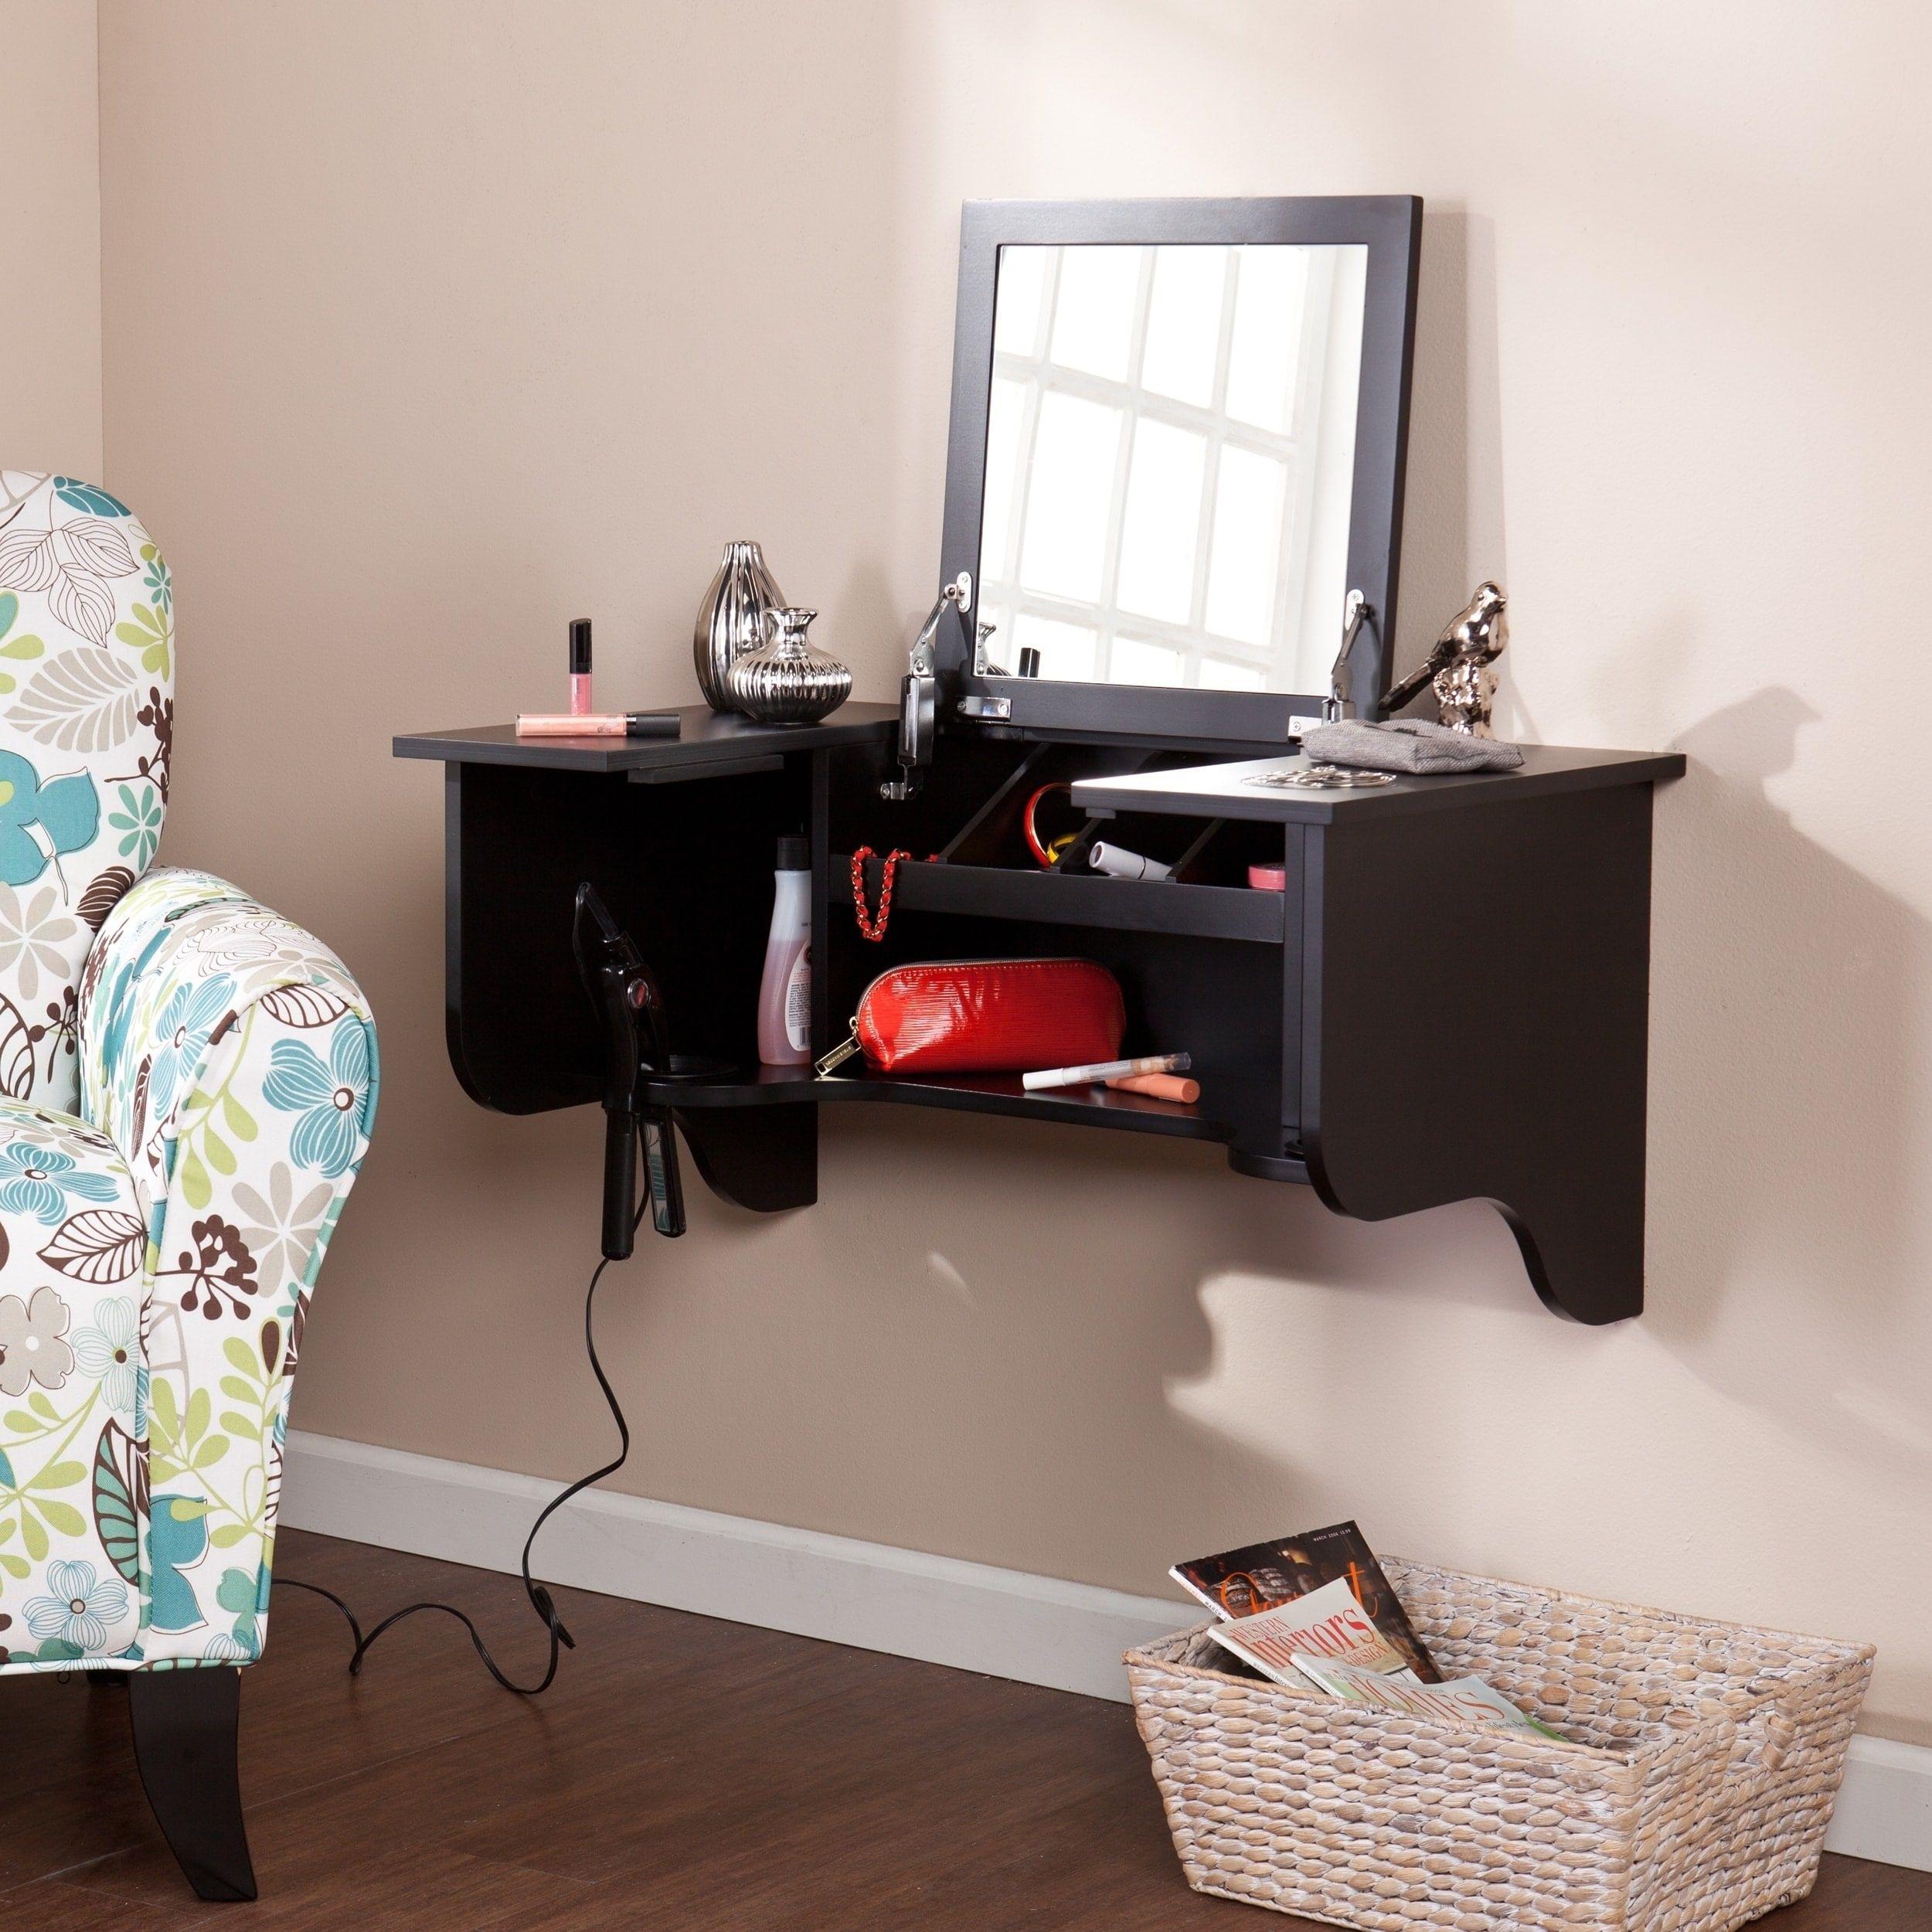 Harper Blvd Black Wall Mount Ledge With Vanity Mirror In